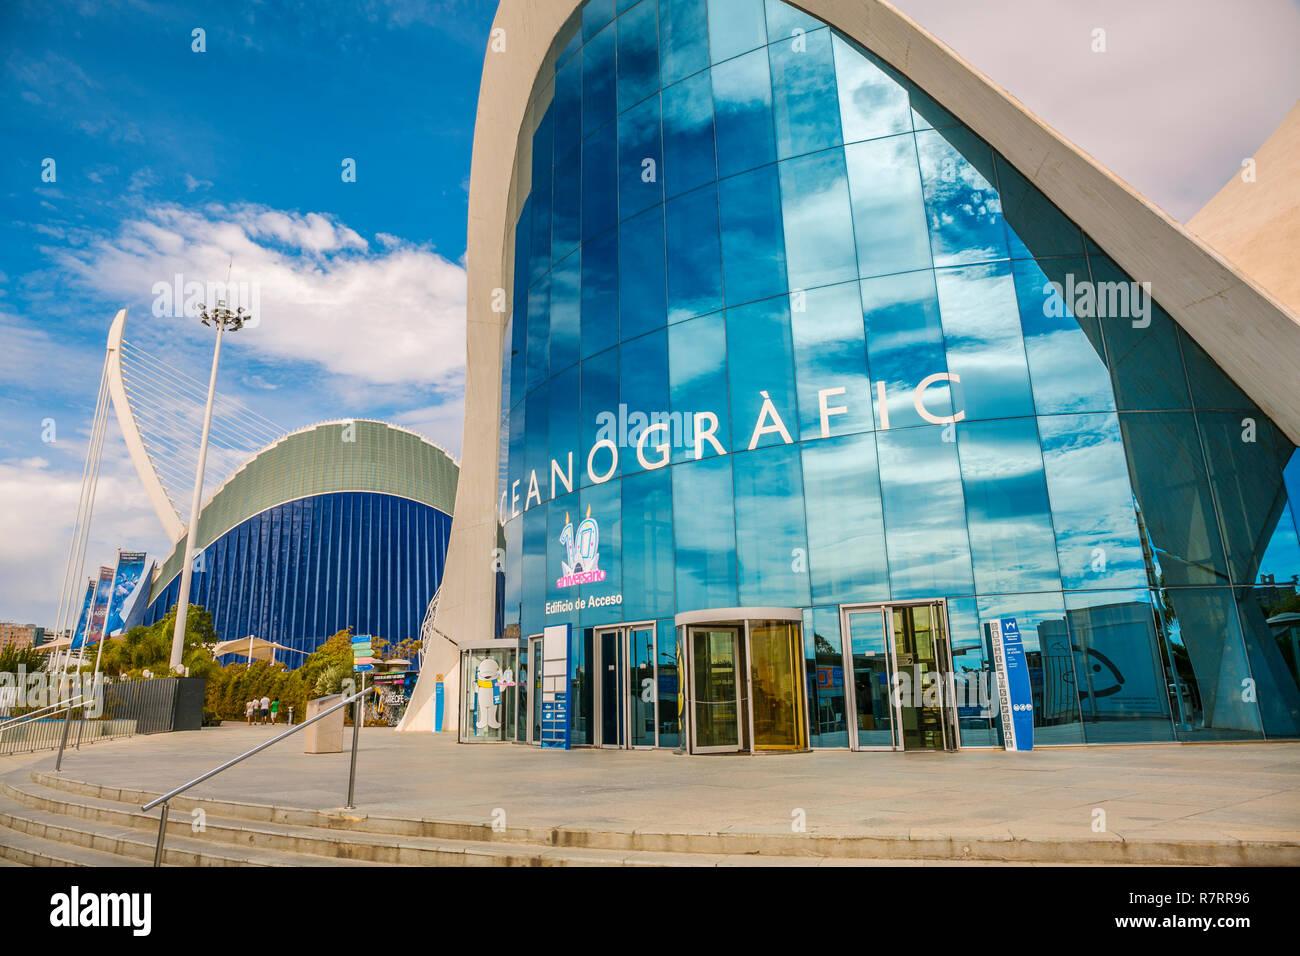 Oceanographic. City of Arts and Sciences. Architect Felix Candela. Valencia. Comunidad Valencia. Spain. Europe - Stock Image